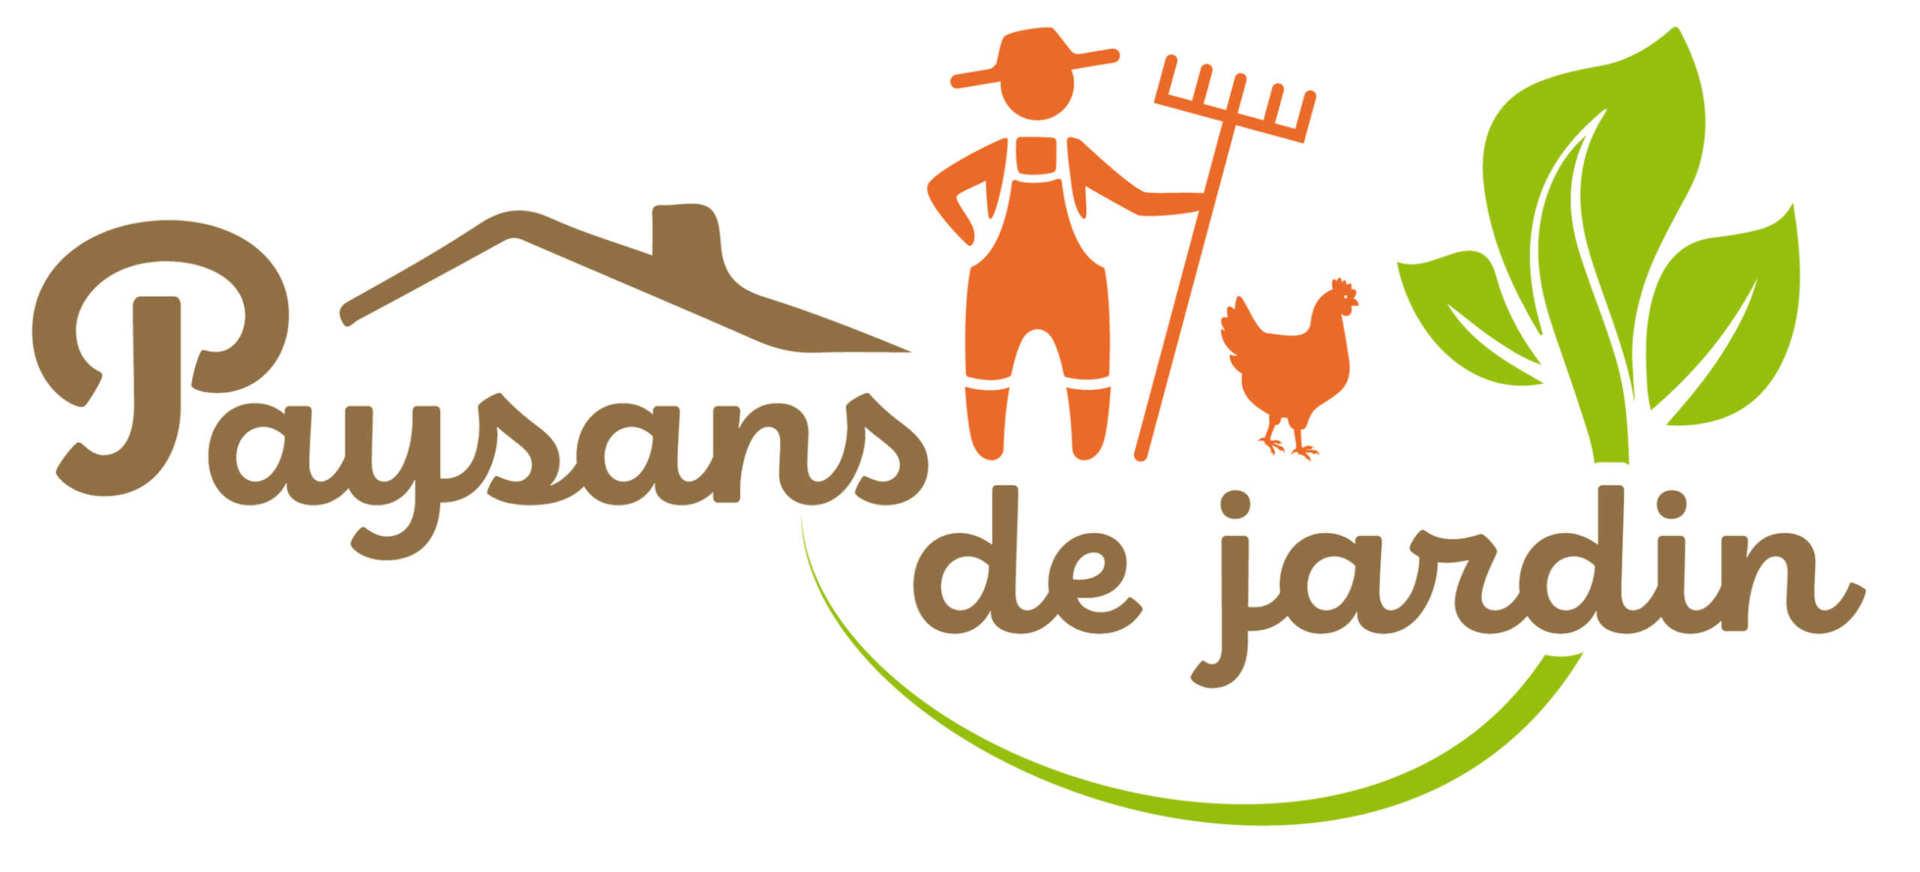 Logo Paysans de jardin